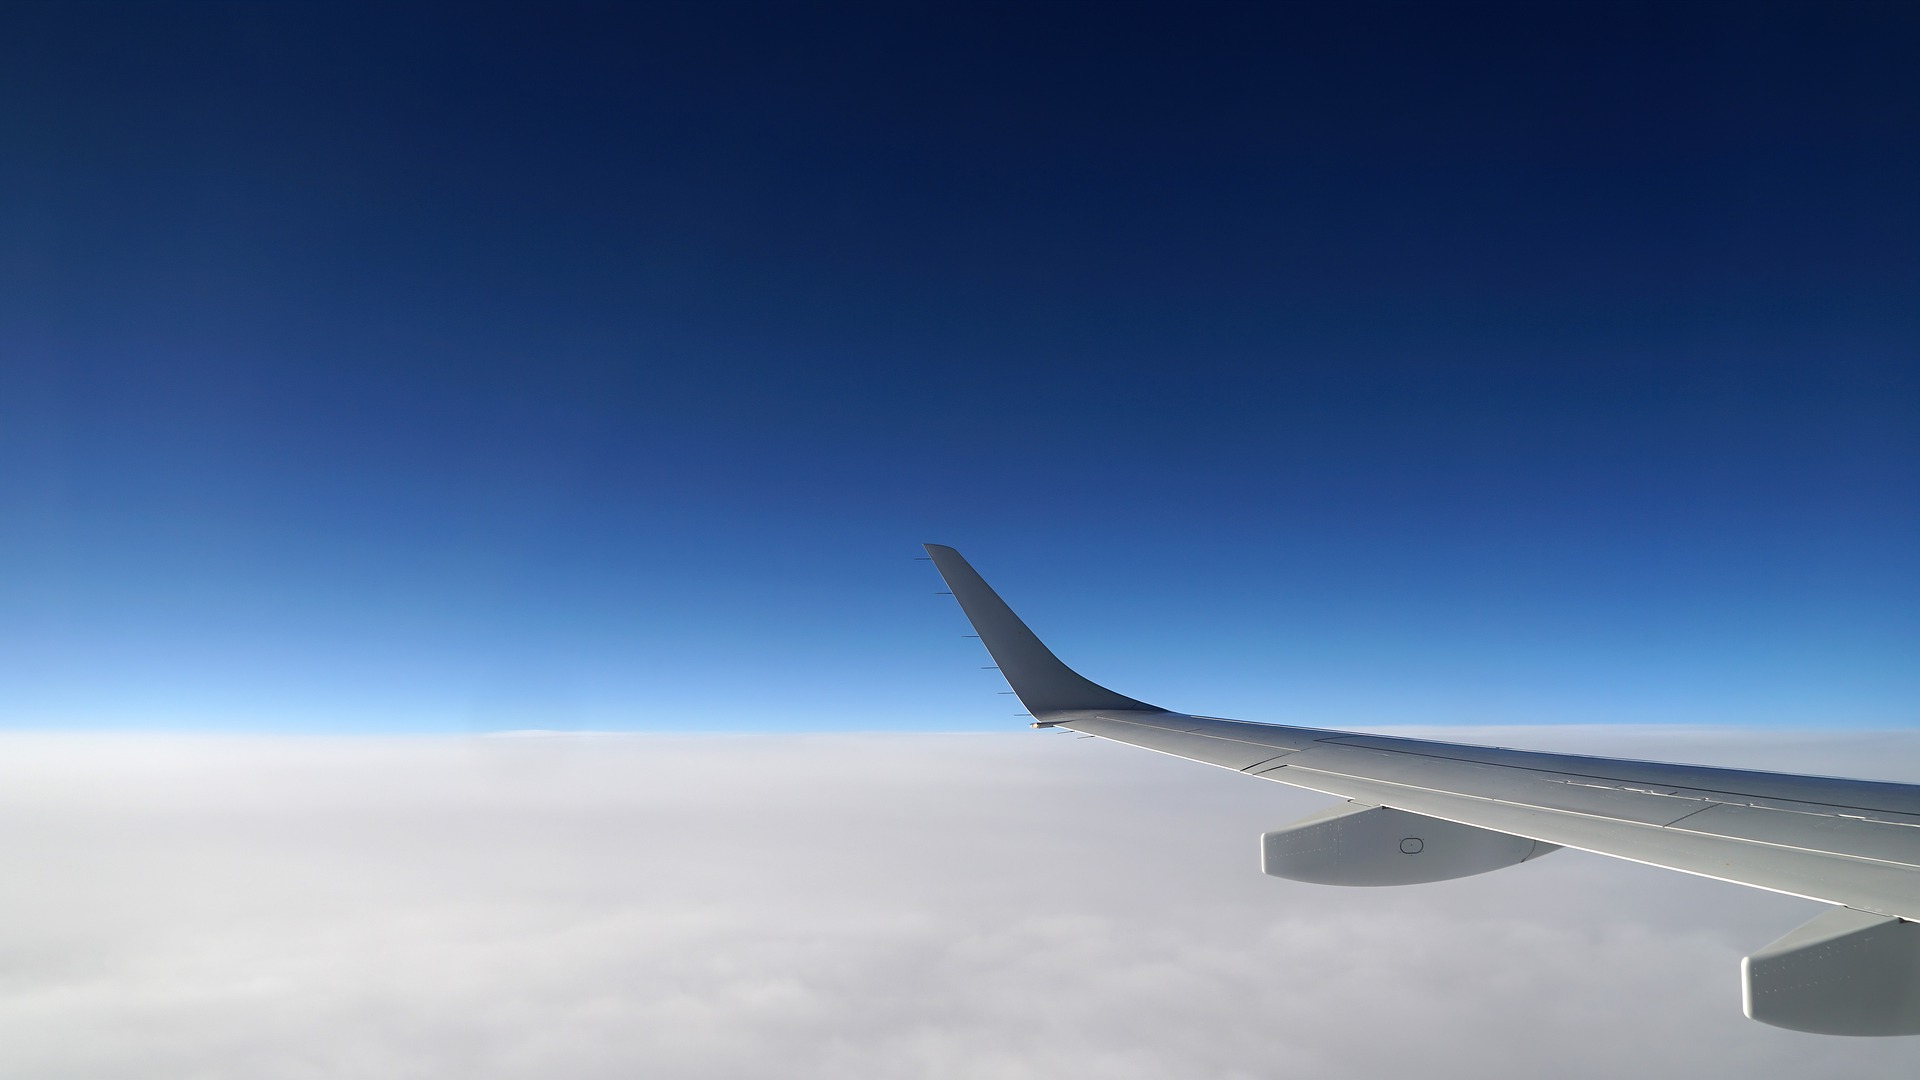 clouds-4286966_1920.jpg